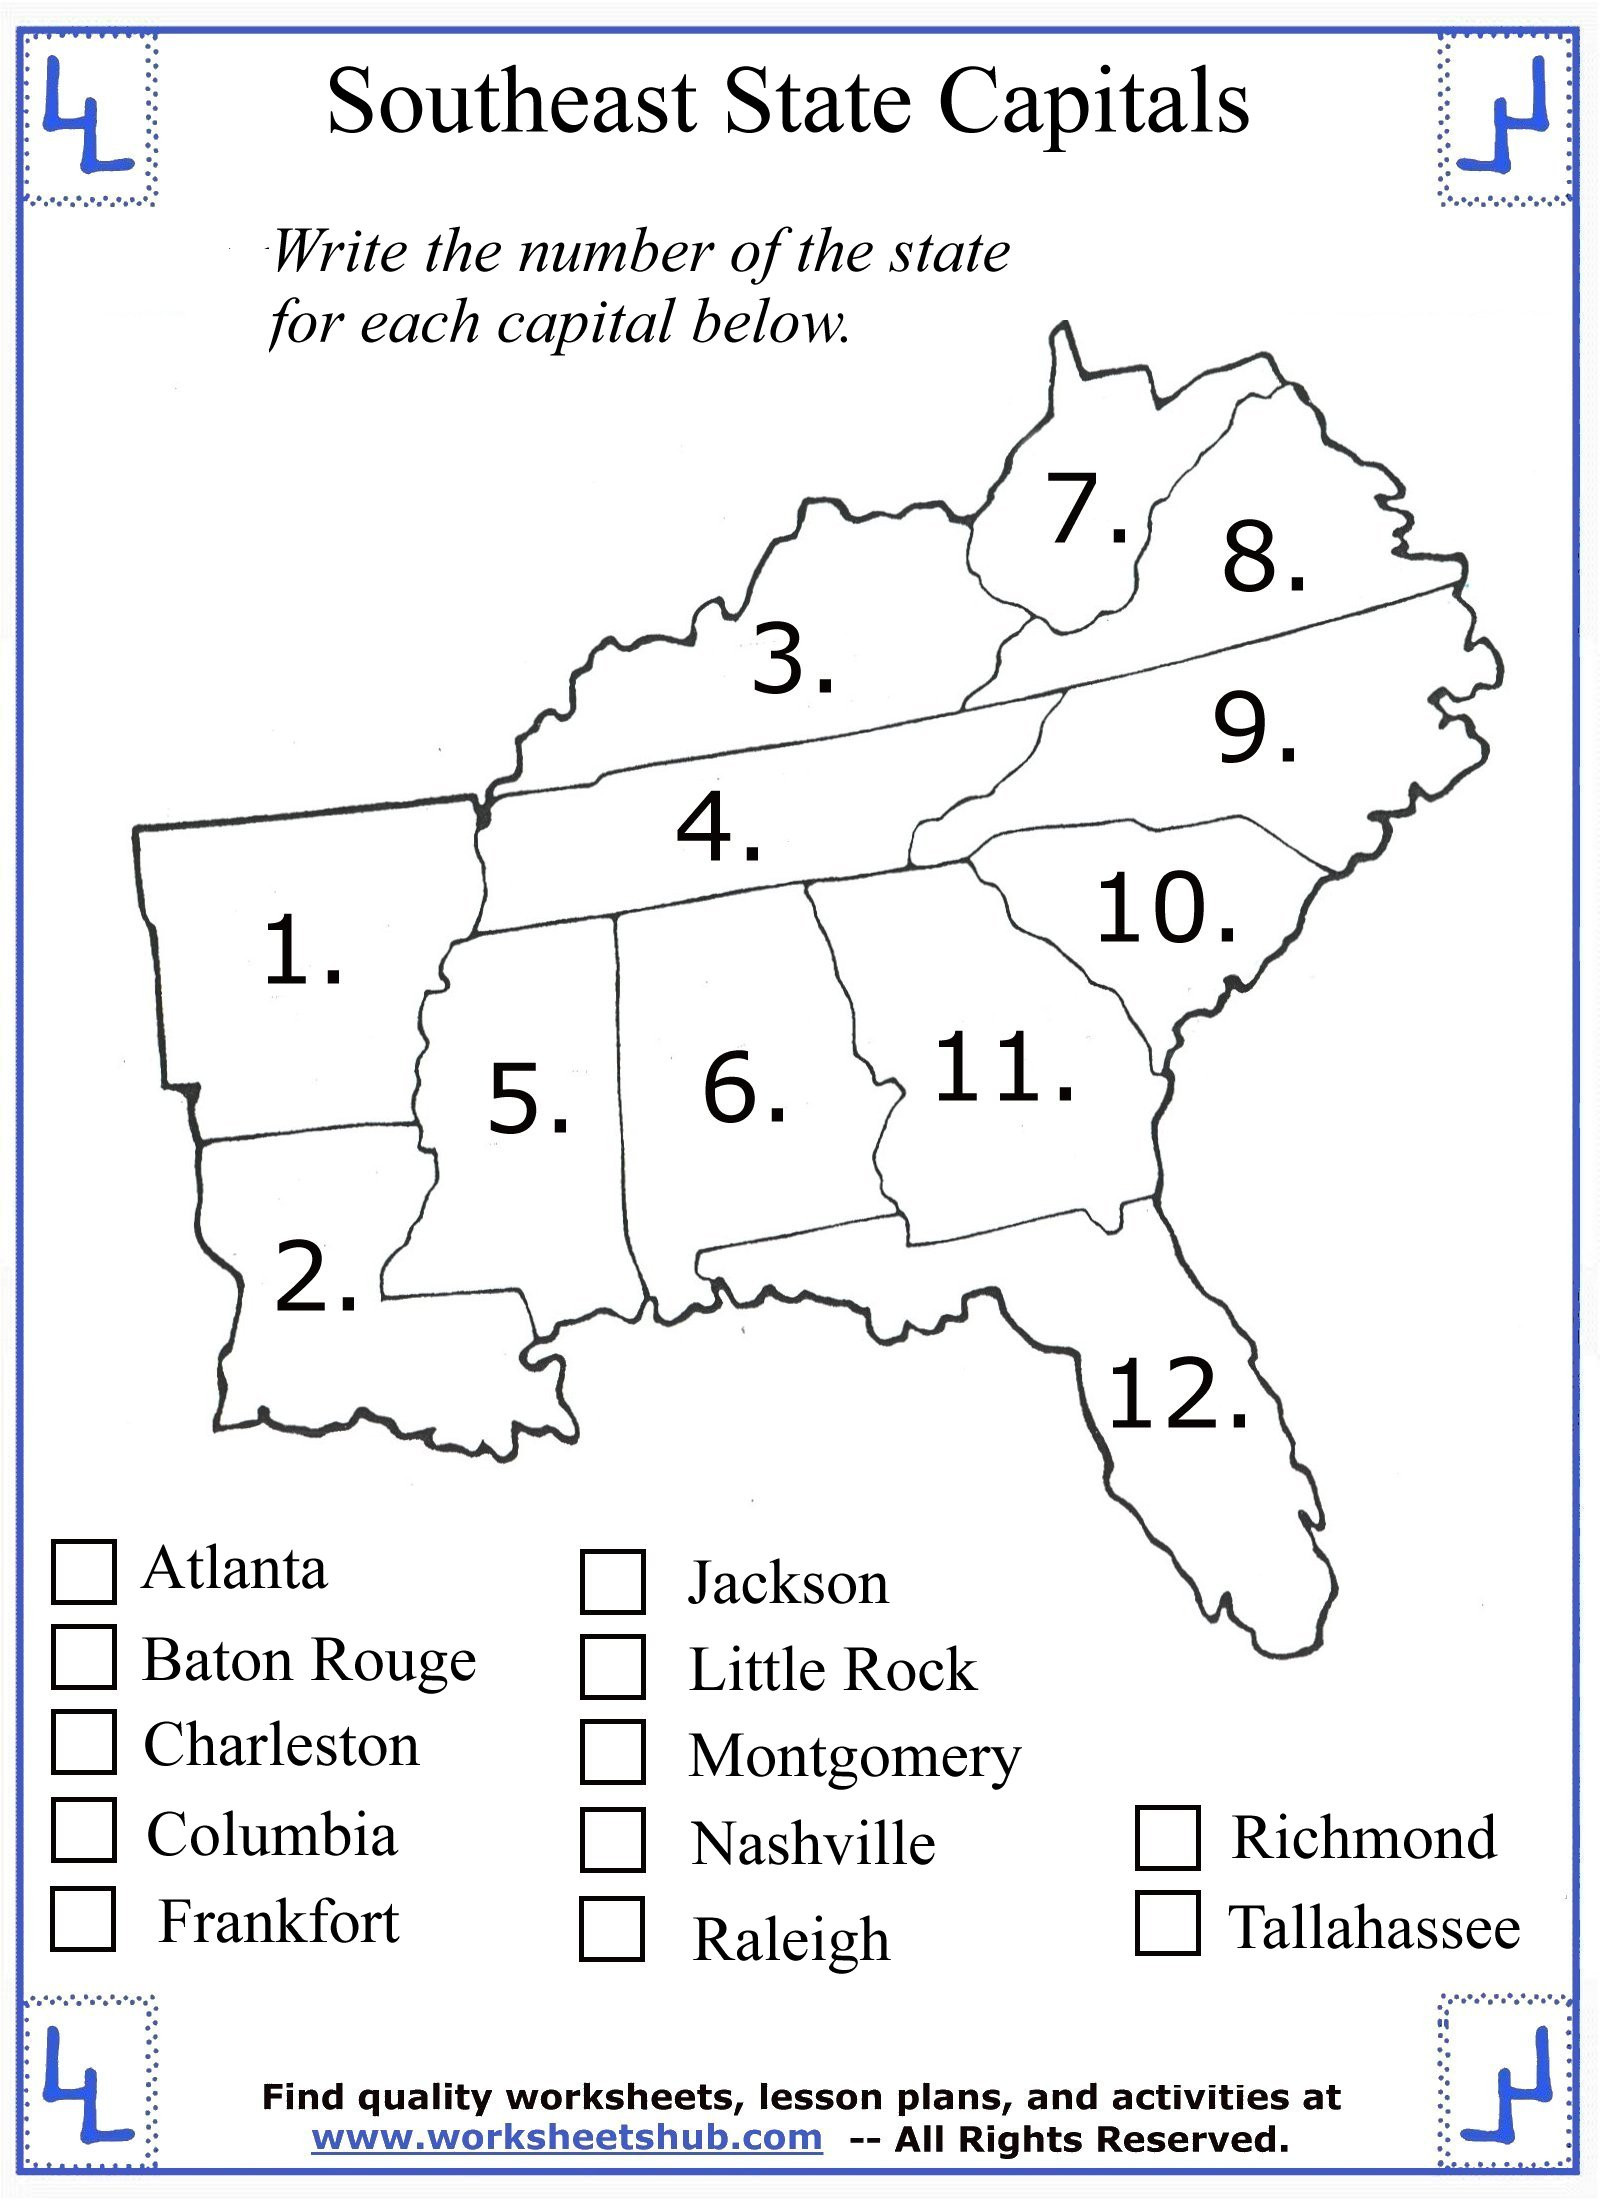 4th Grade History Worksheets 4th Grade social Stu S southeast Region States